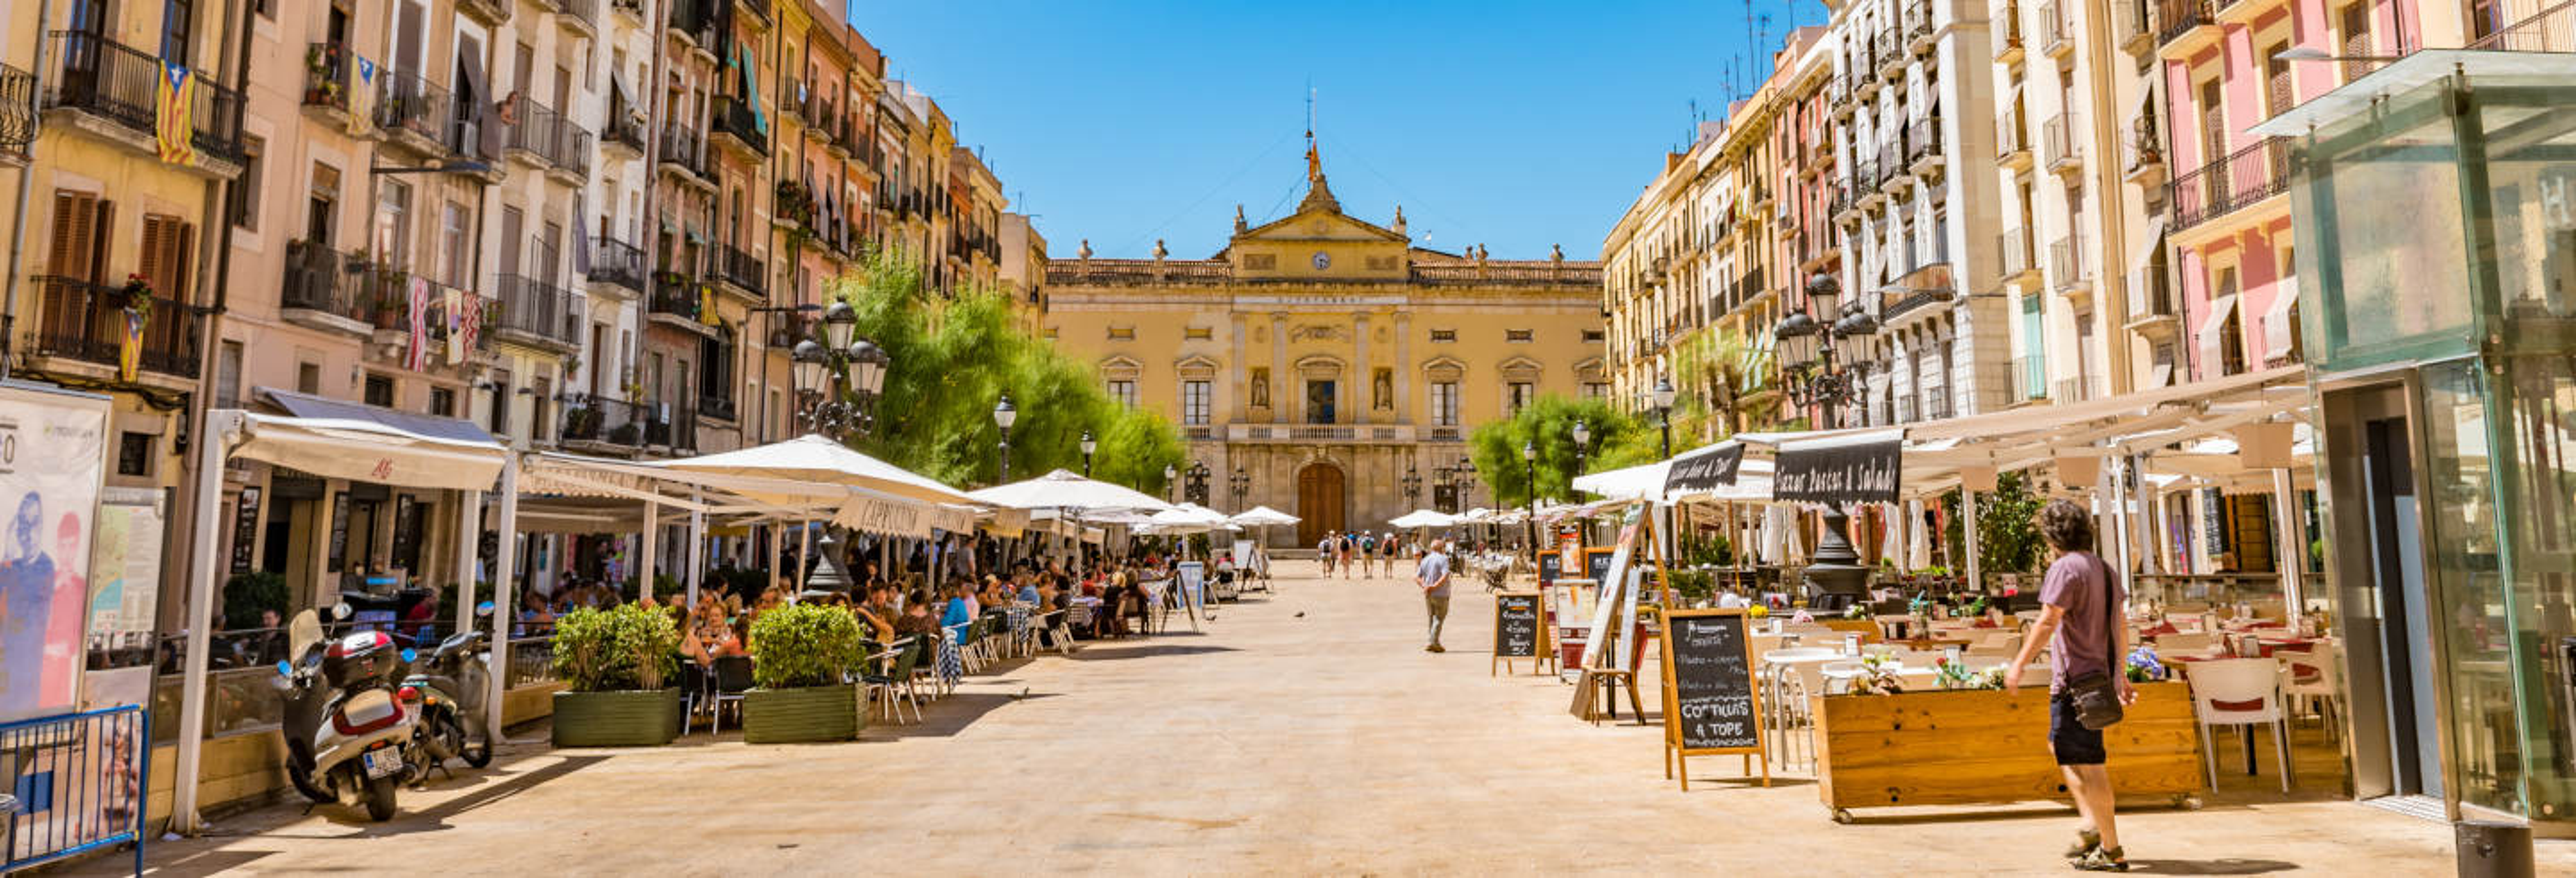 Visita guiada por la Tarragona modernista